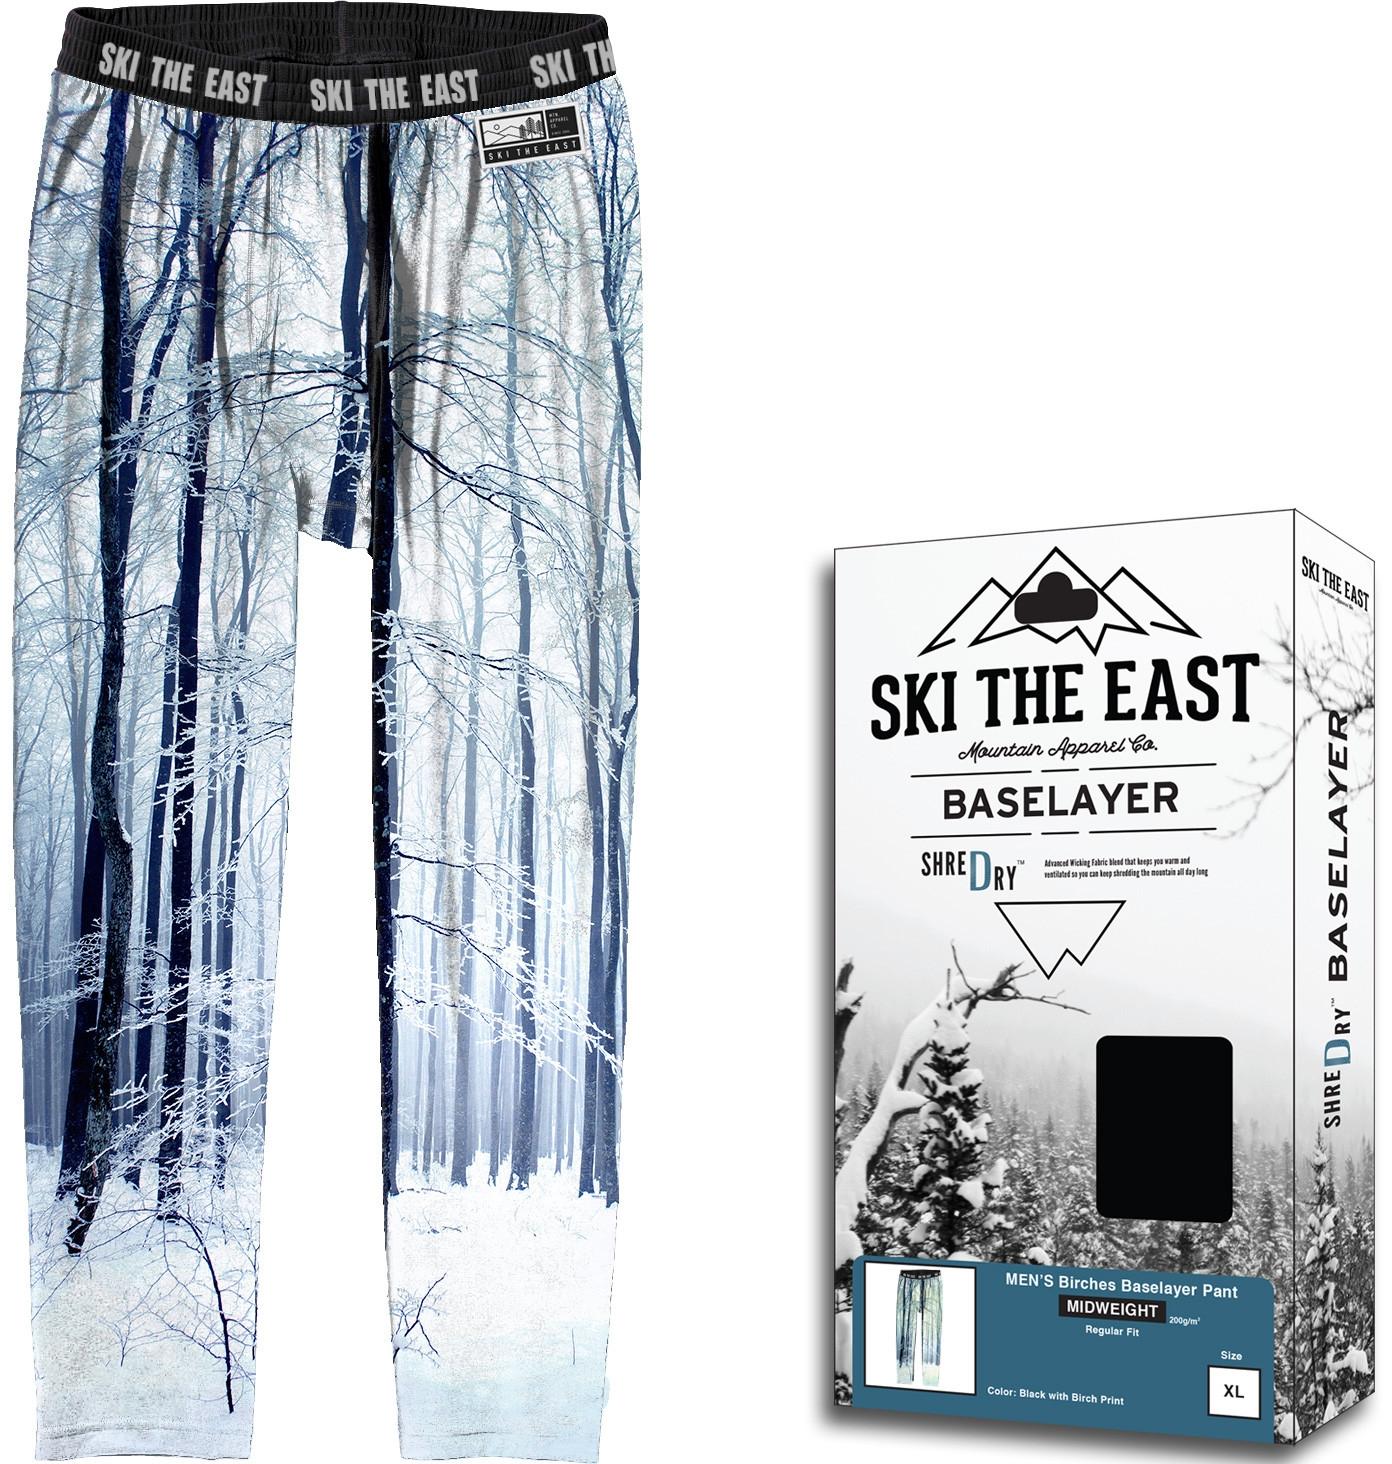 Ski The East Glades Baselayer Pants, $58